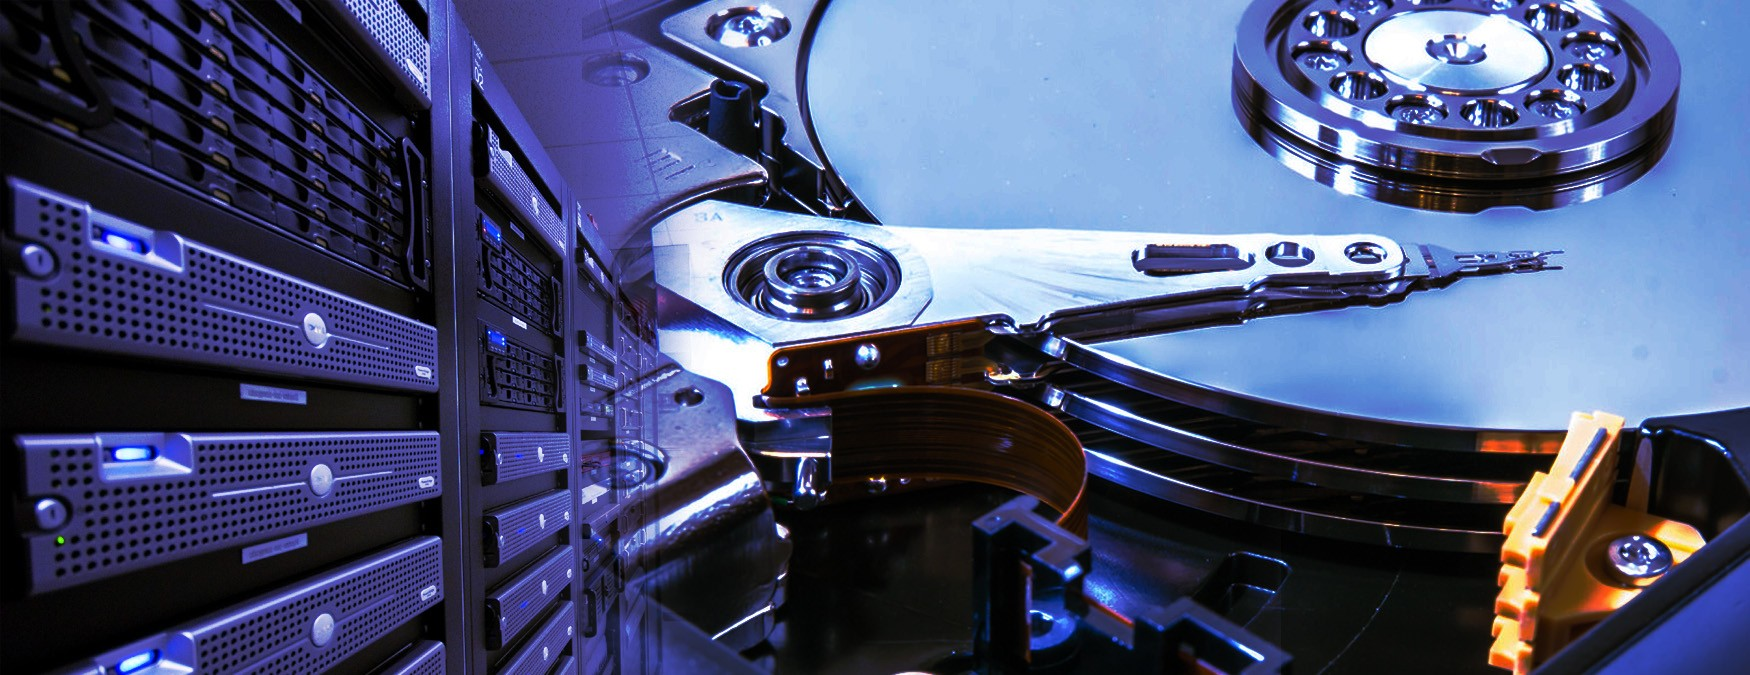 Off Site Shredding Image - AGR